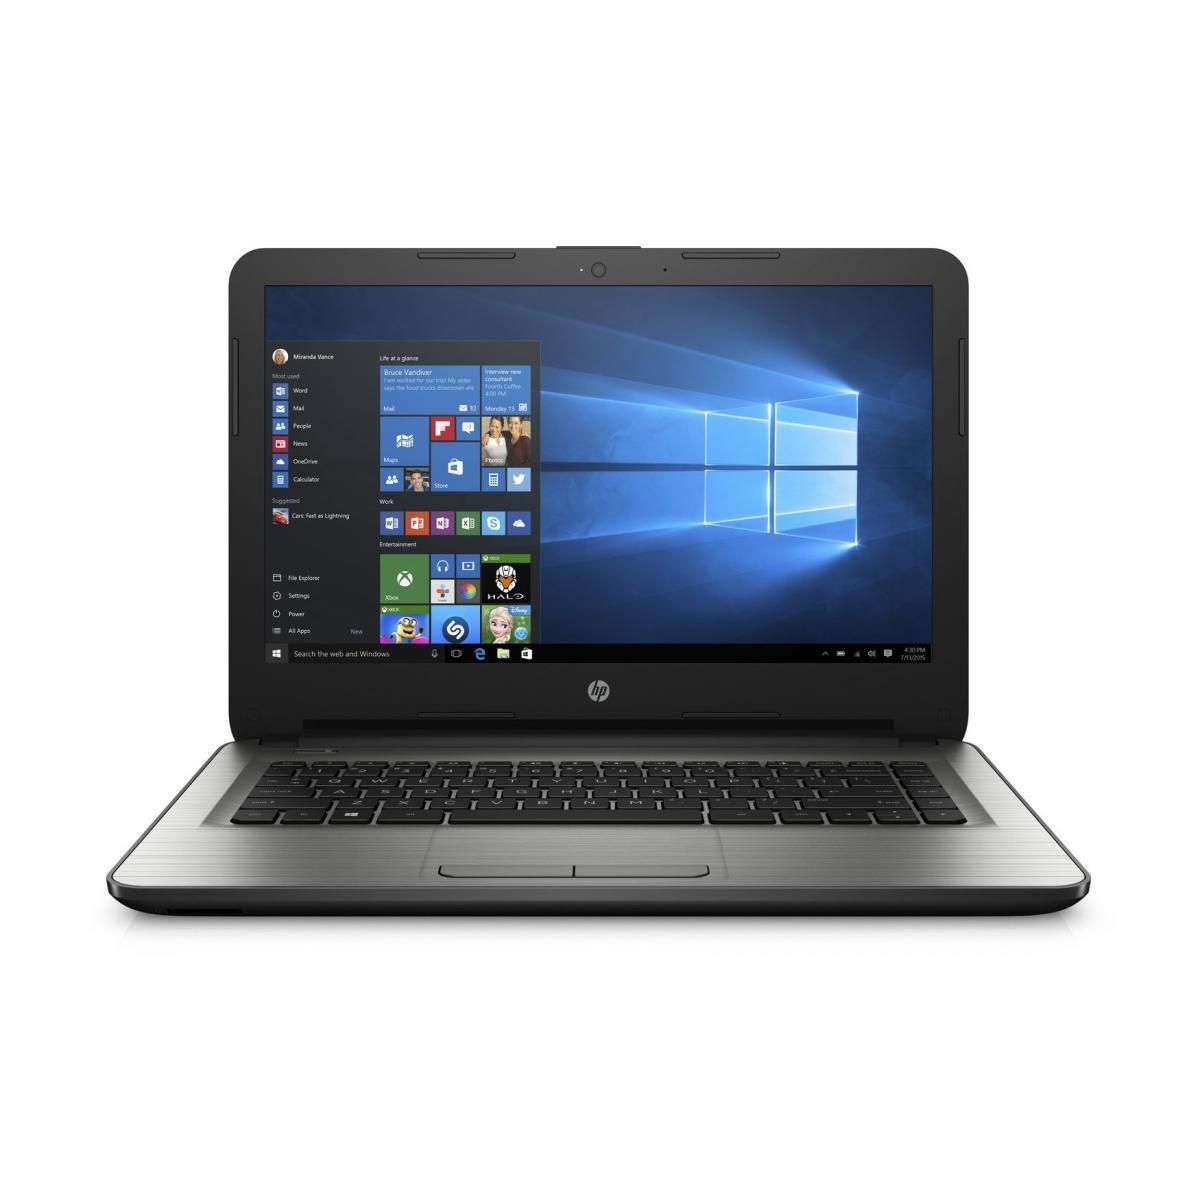 HP Notebook - 15-bs037ne   2CT89EA   Smart Systems   Amman ...